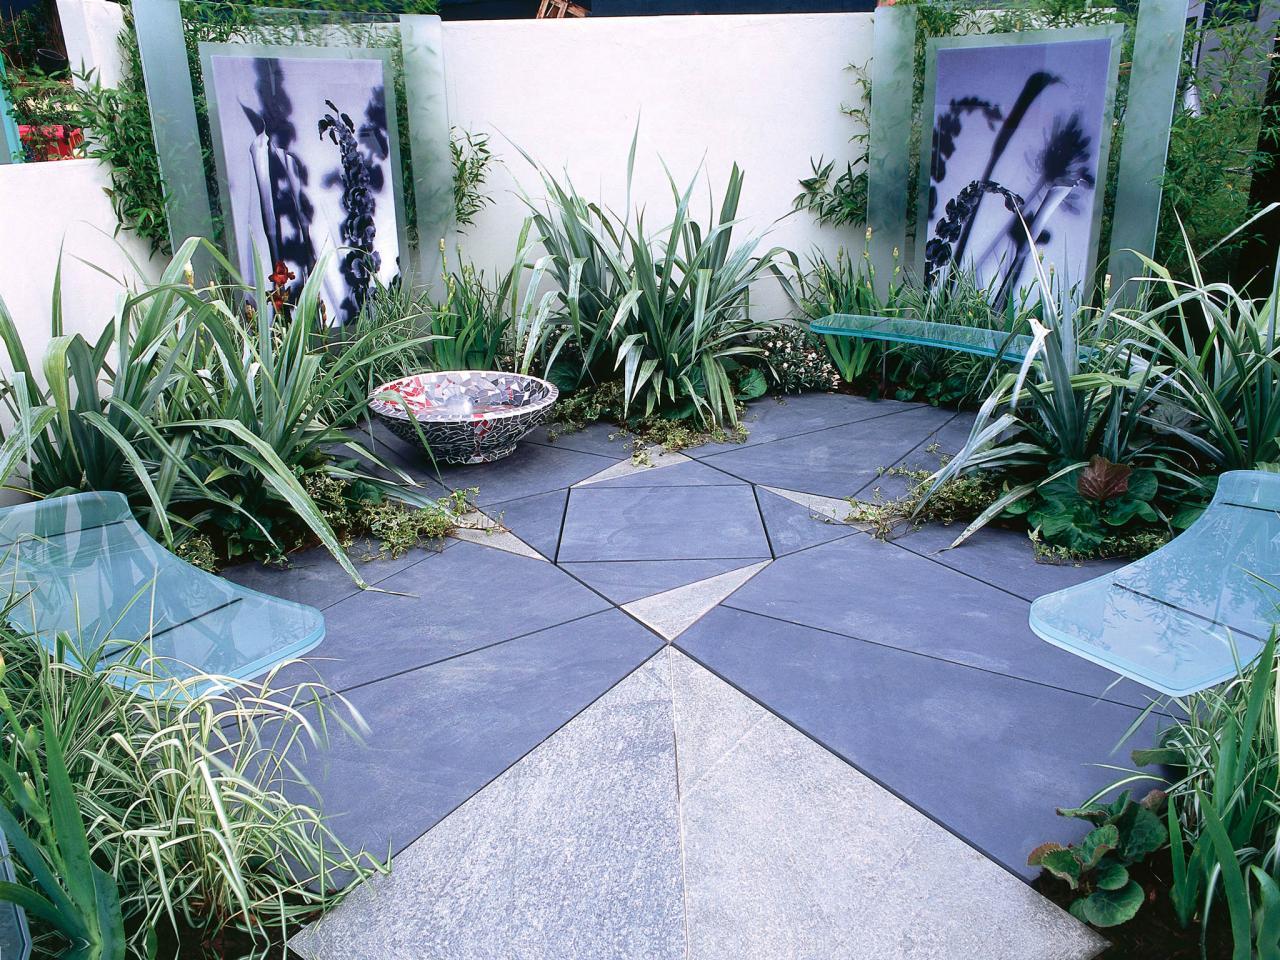 small gardens ambient lighting softens shadows in evening garden DQCKGTF